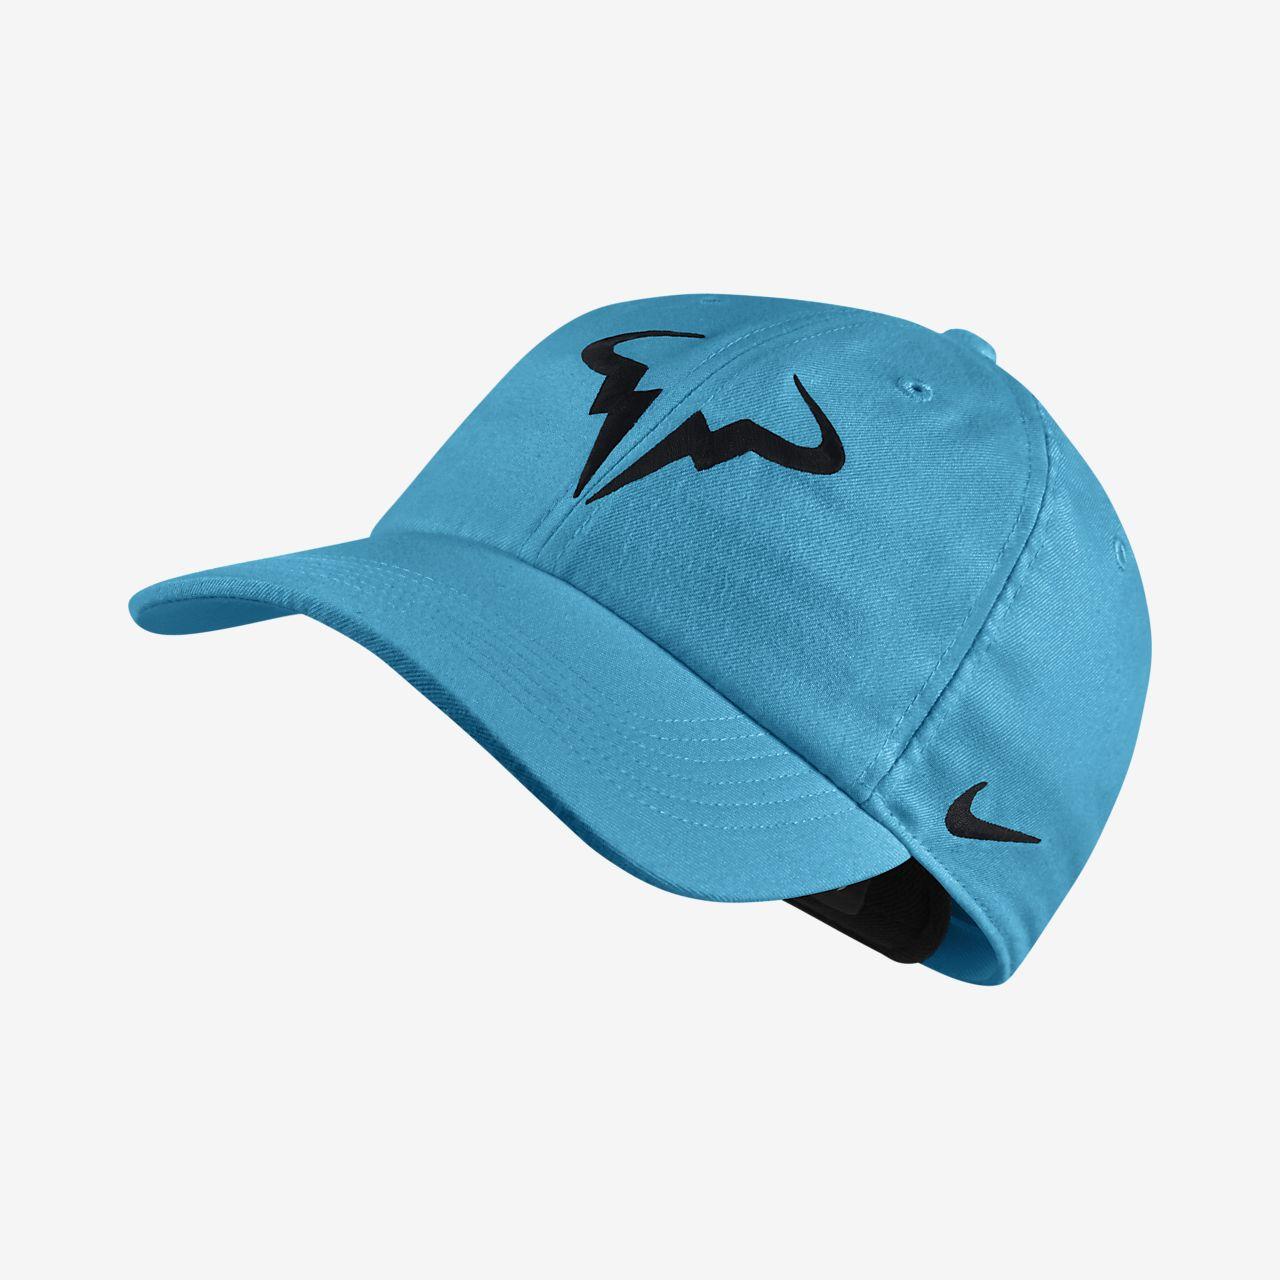 48de014b0fd99 NikeCourt AeroBill Rafa H86 Adjustable Tennis Hat. Nike.com CA